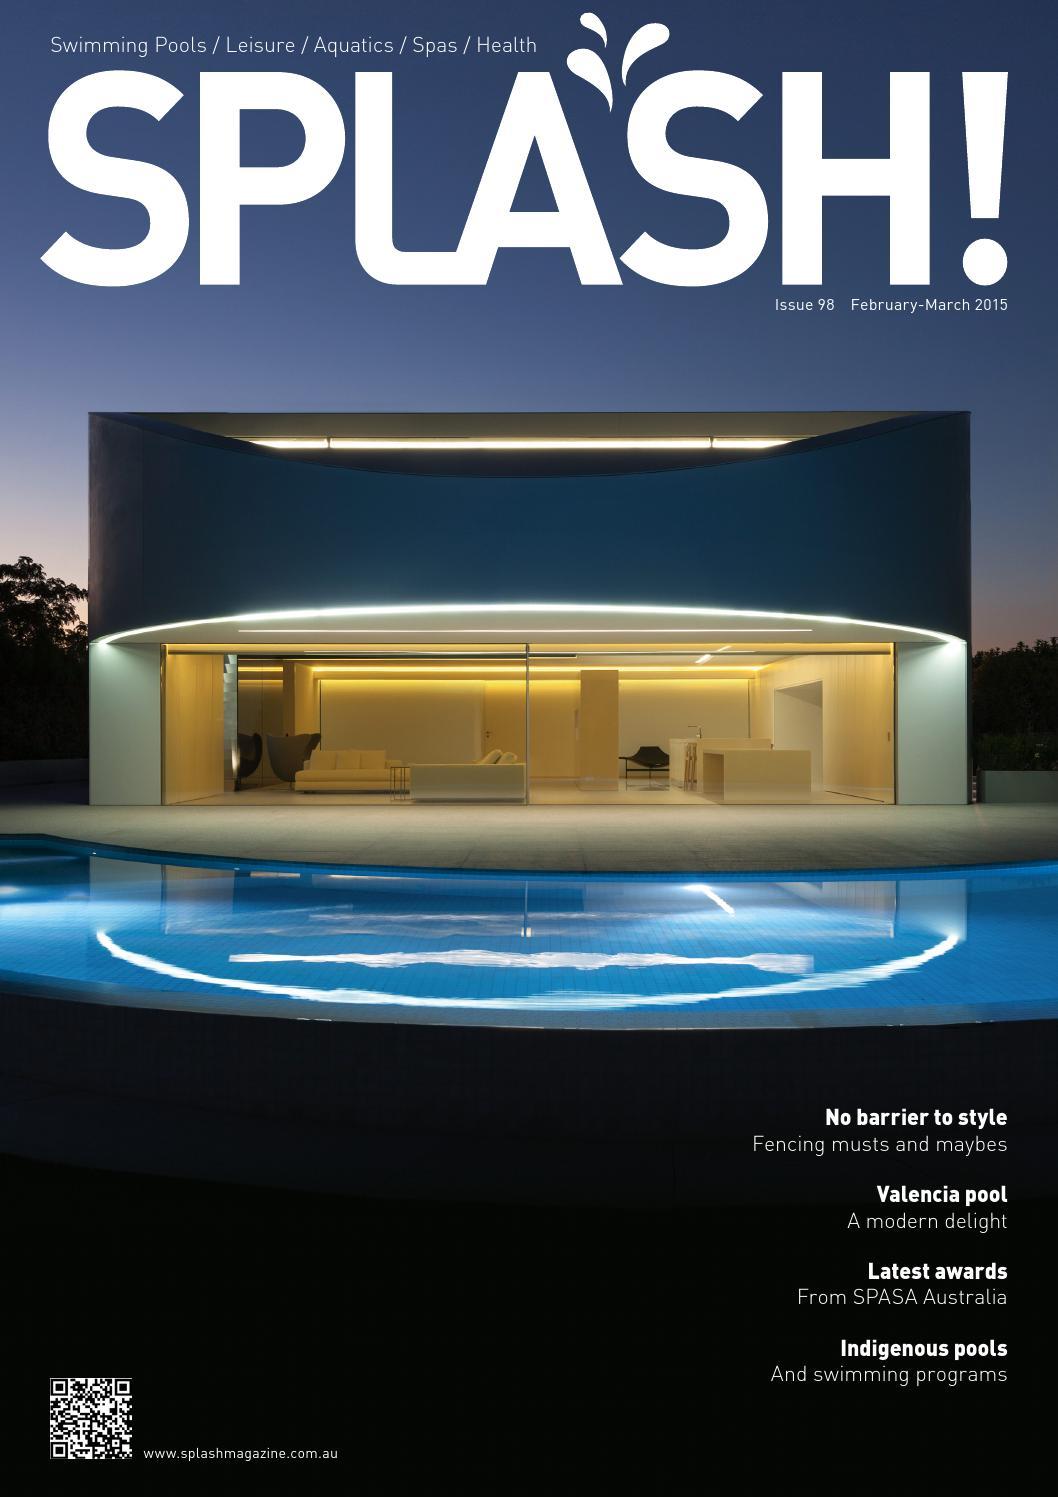 Splash Feb-March 2015 Issue - 98 by The Intermedia Group - issuu